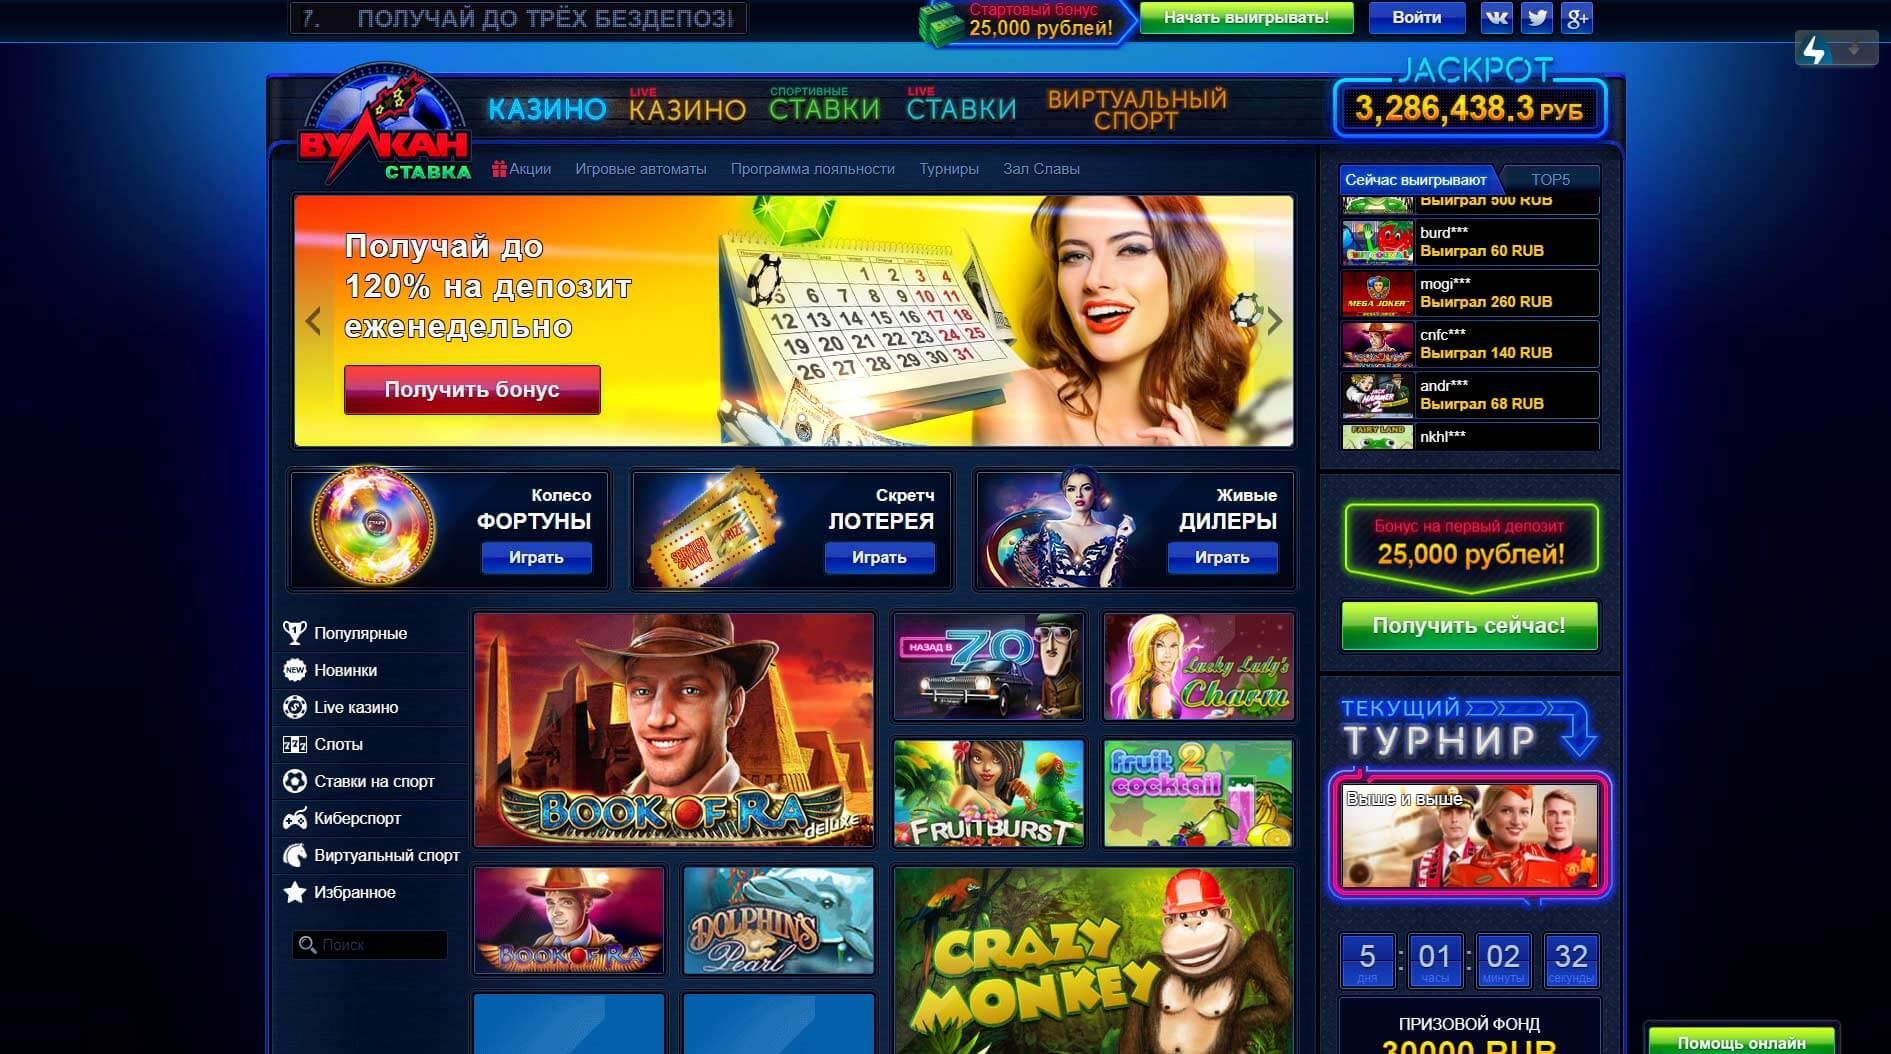 онлайн казино вулкан оригинал зеркало сайта